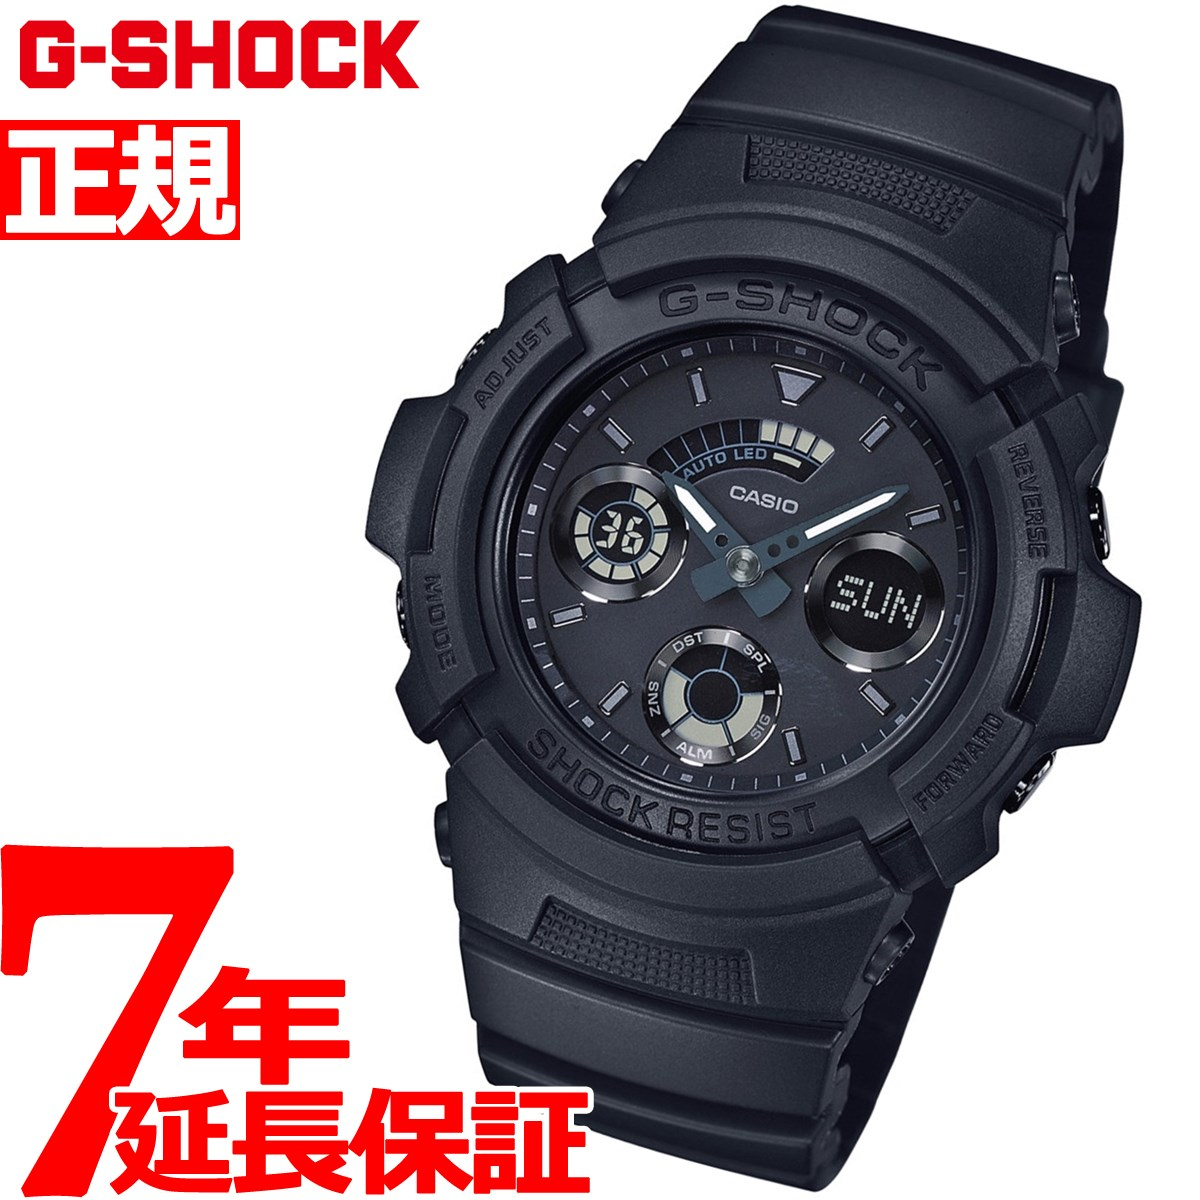 G-SHOCK ブラック アナデジ 腕時計 メンズ AW-591BB-1AJF